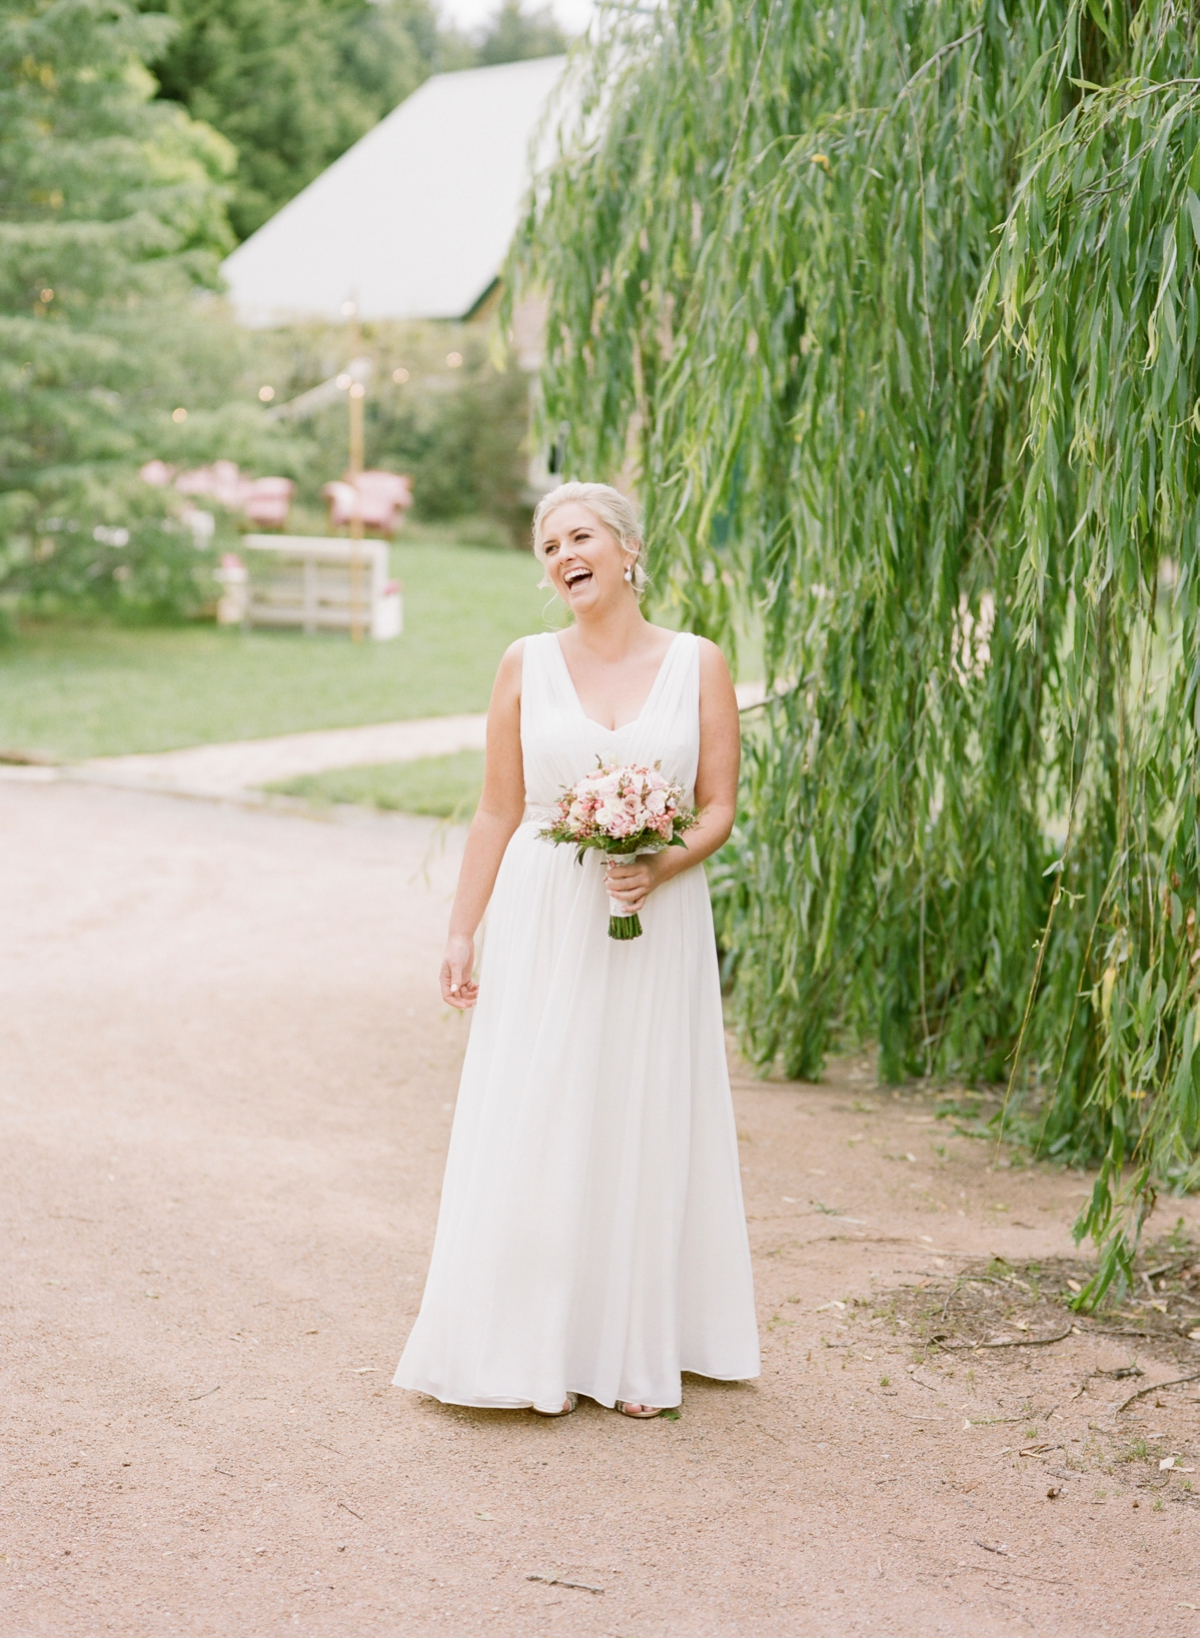 Monterose berry farm wedding by Mr Edwards Photography_0722.jpg